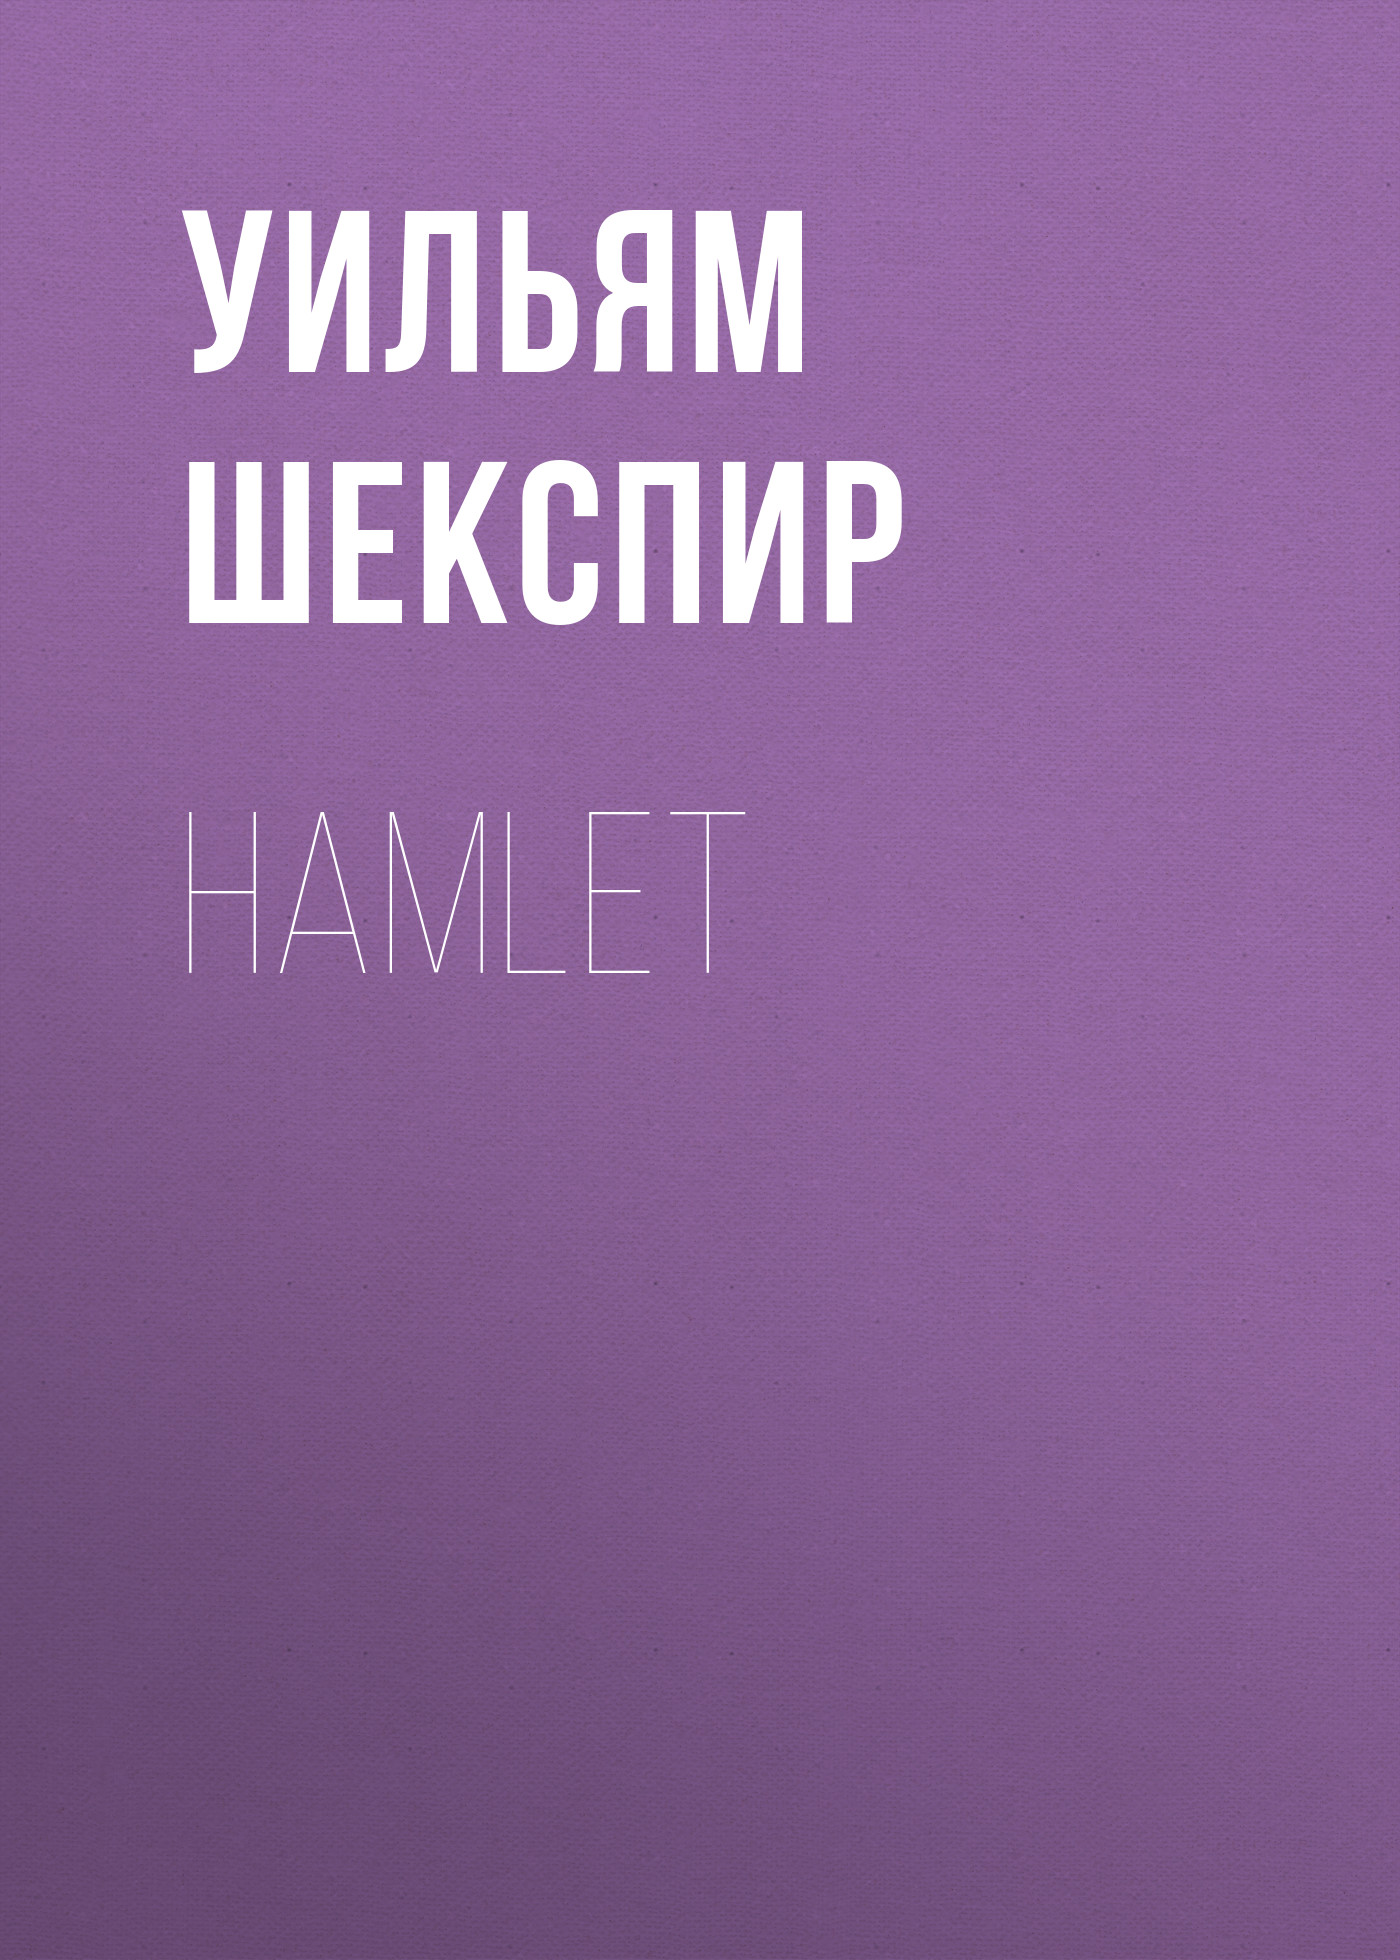 Уильям Шекспир Hamlet wanted hamlet